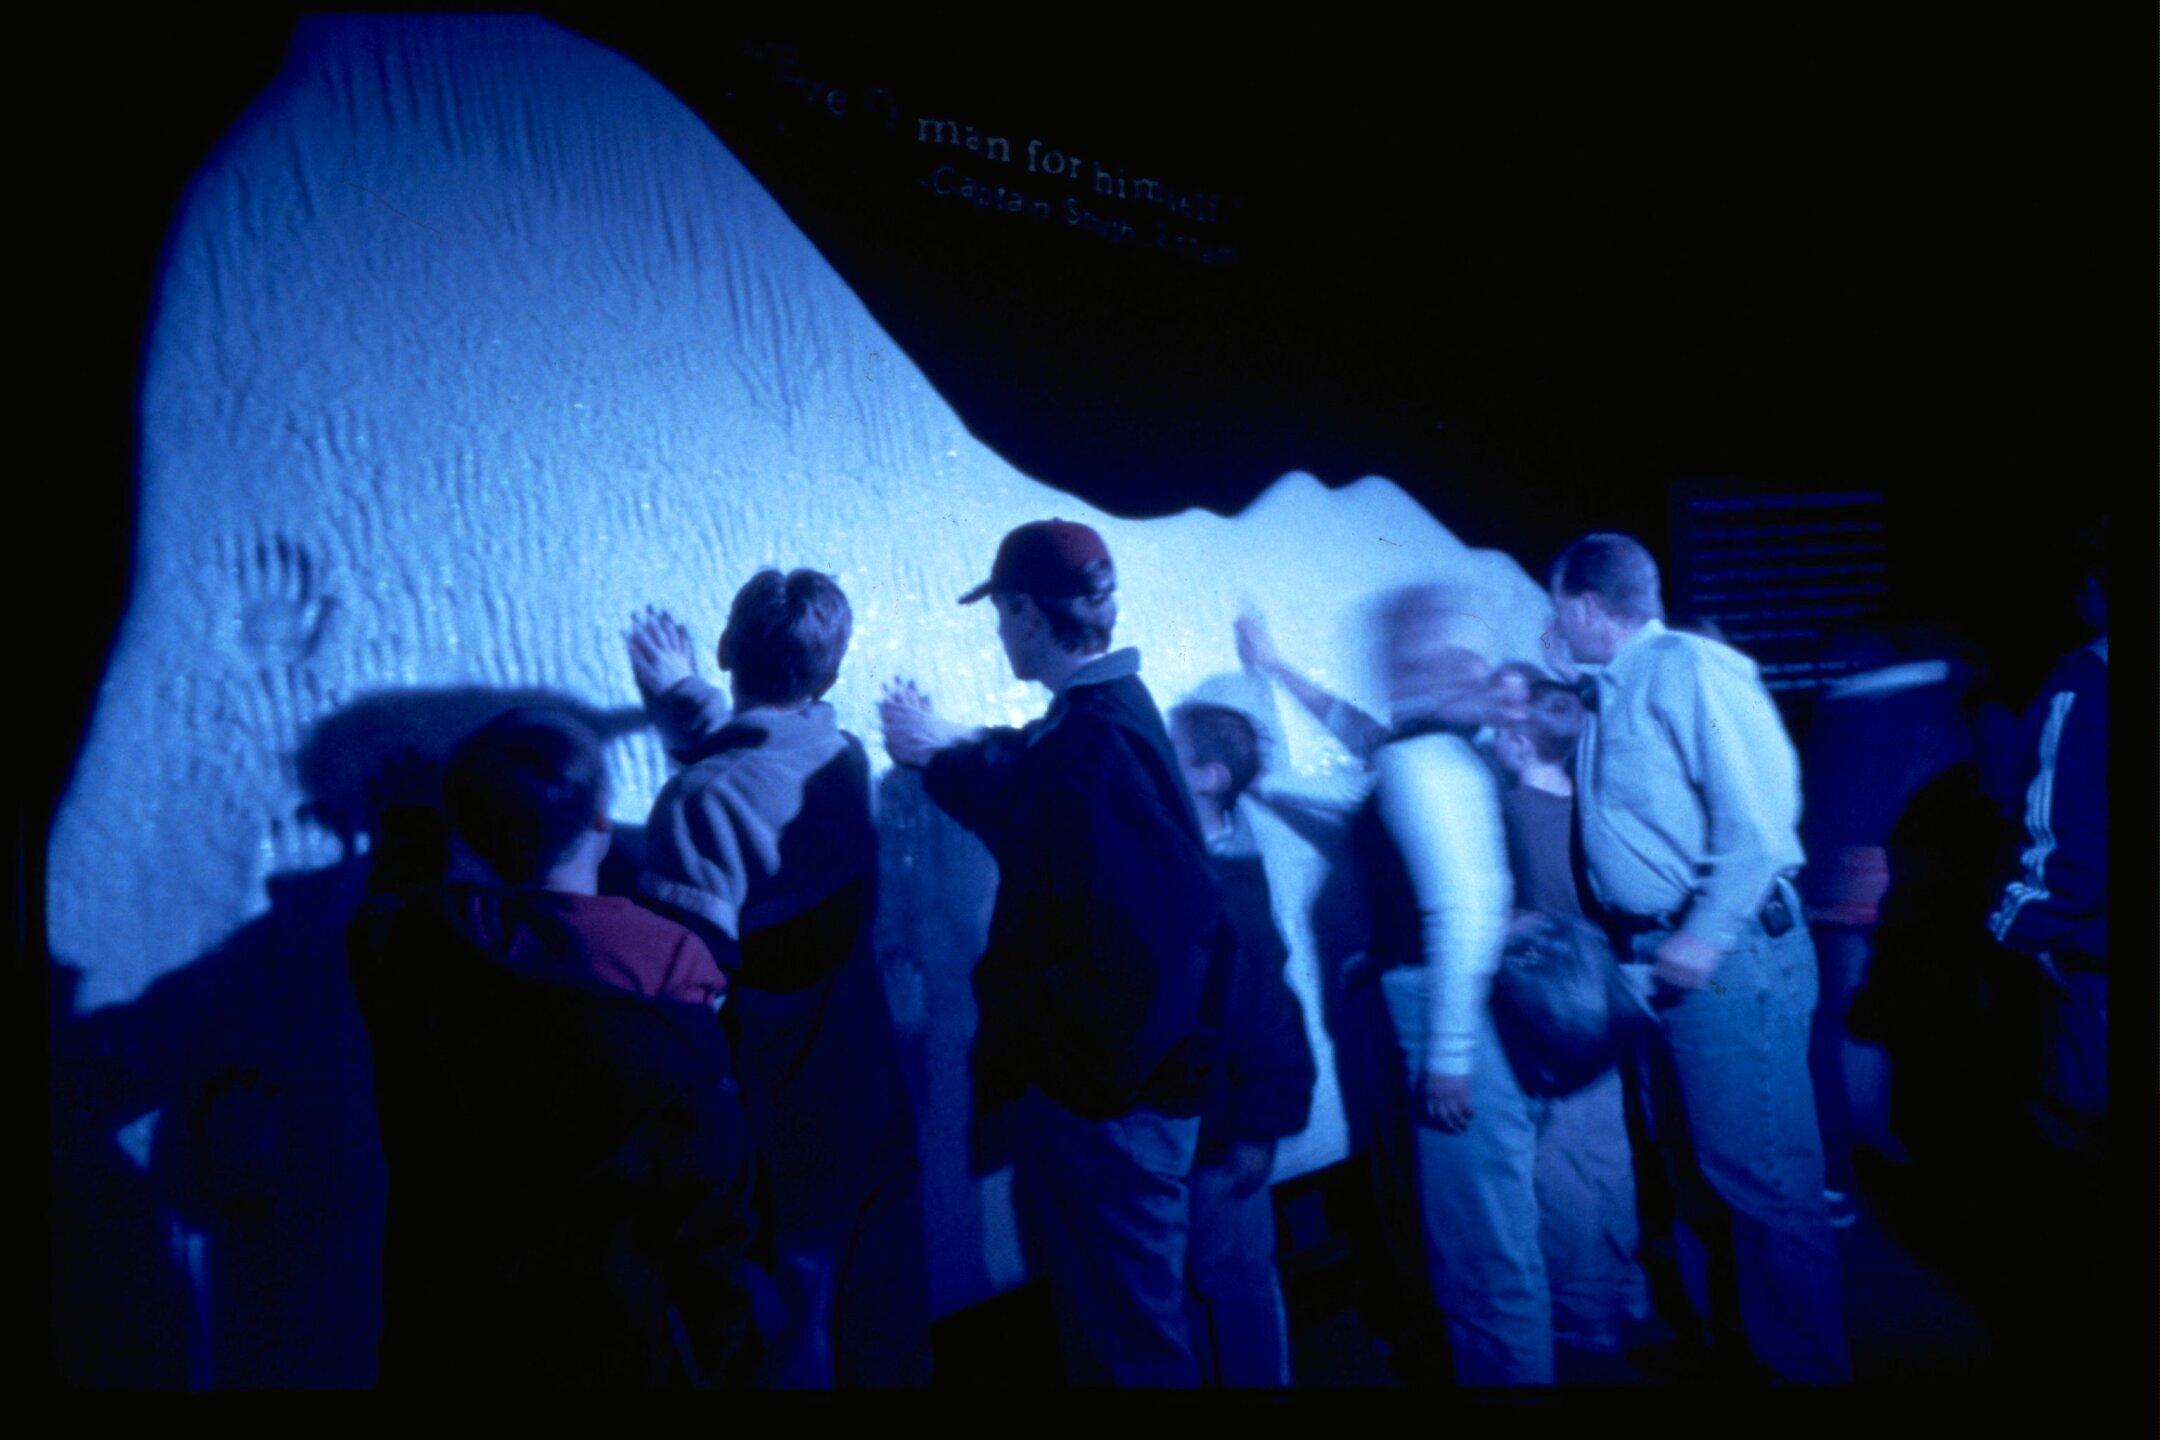 Ice Wall_Titanic the Artifact Exhibition at Luxor Hotel & Casino.jpg